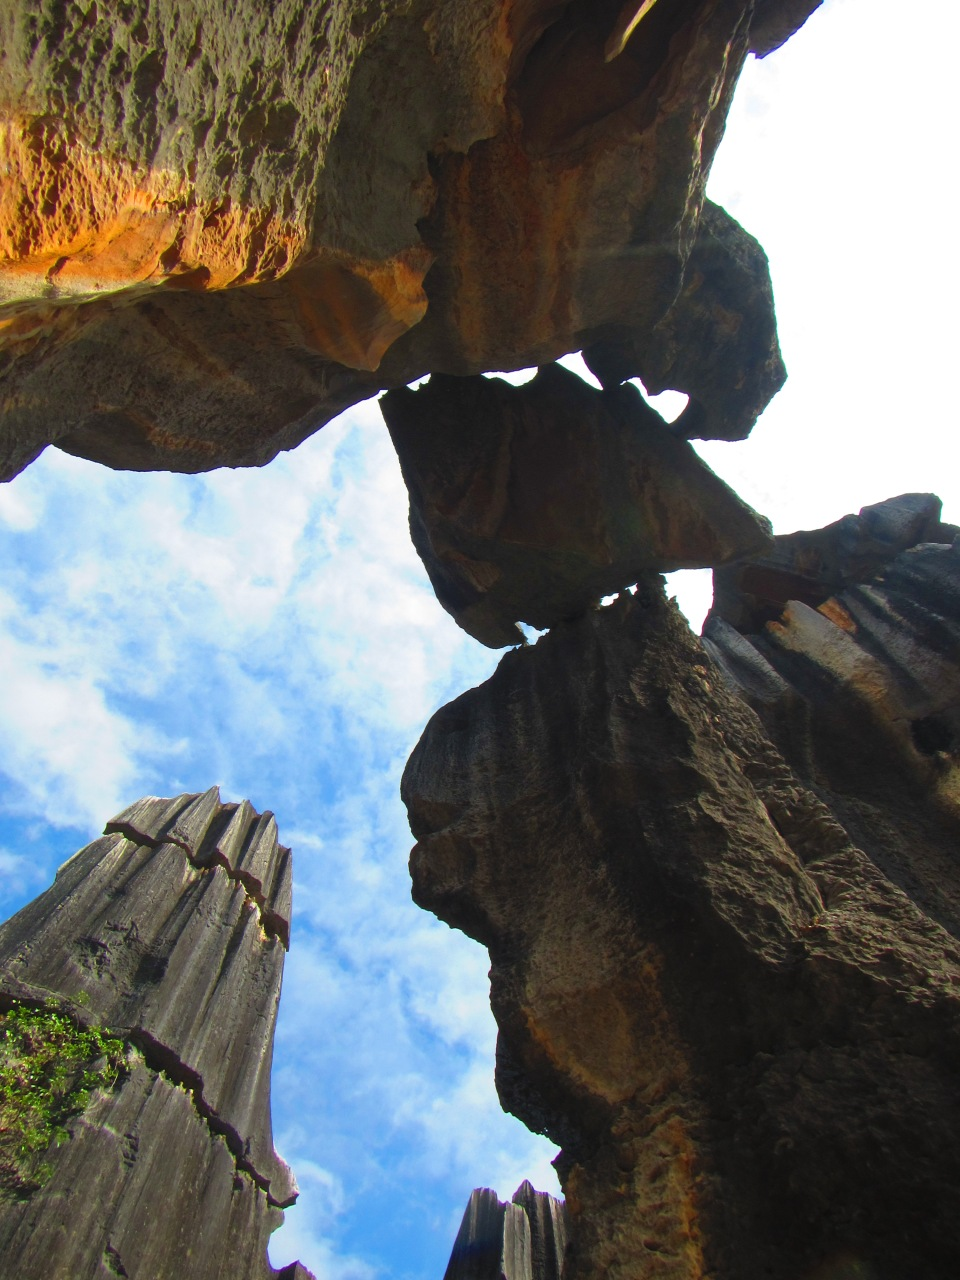 6386 - waking around the stone forest near Kunming